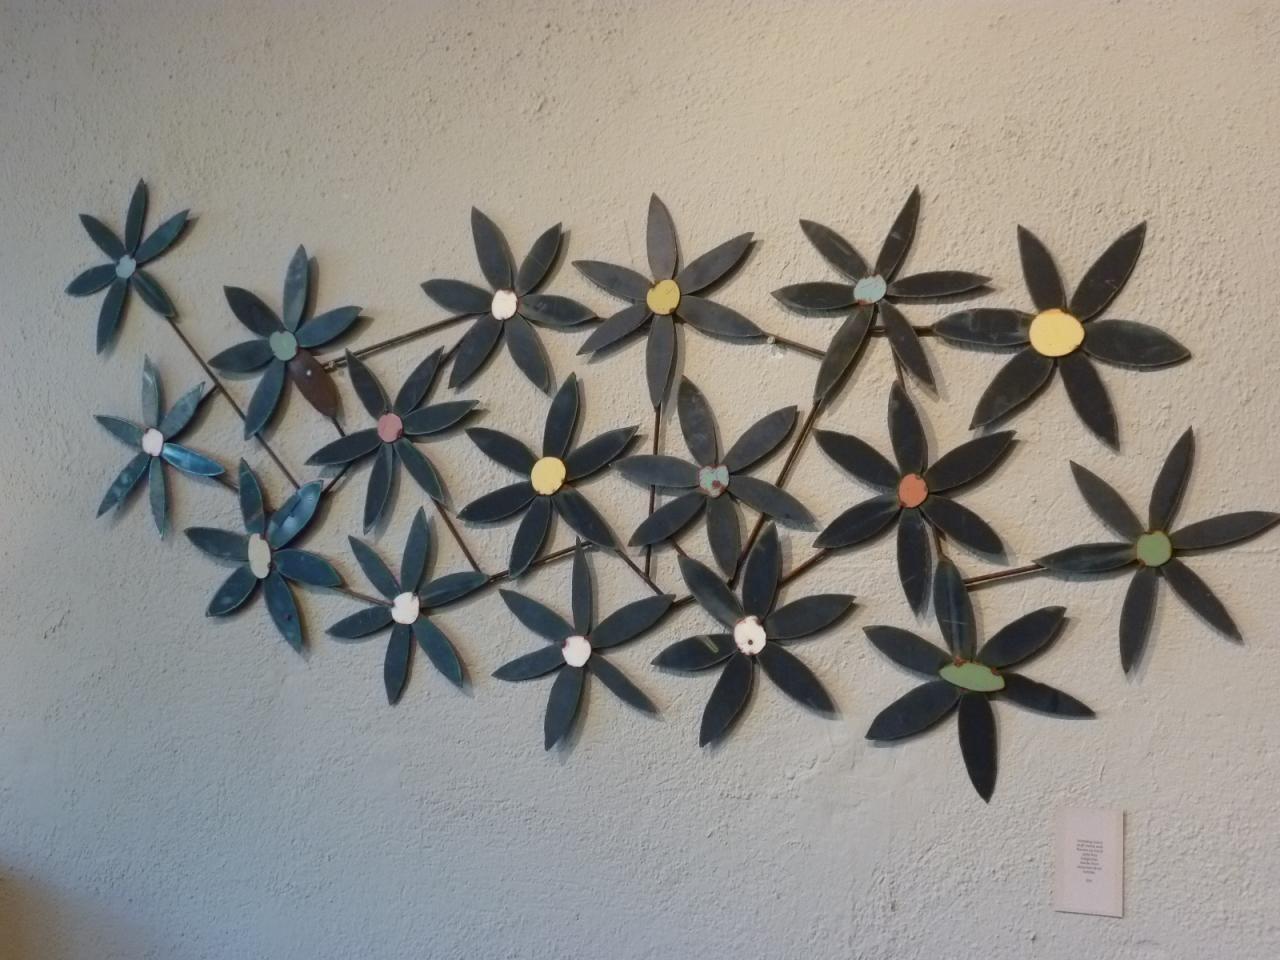 Metalwallartinspirationg metal flowers pinterest